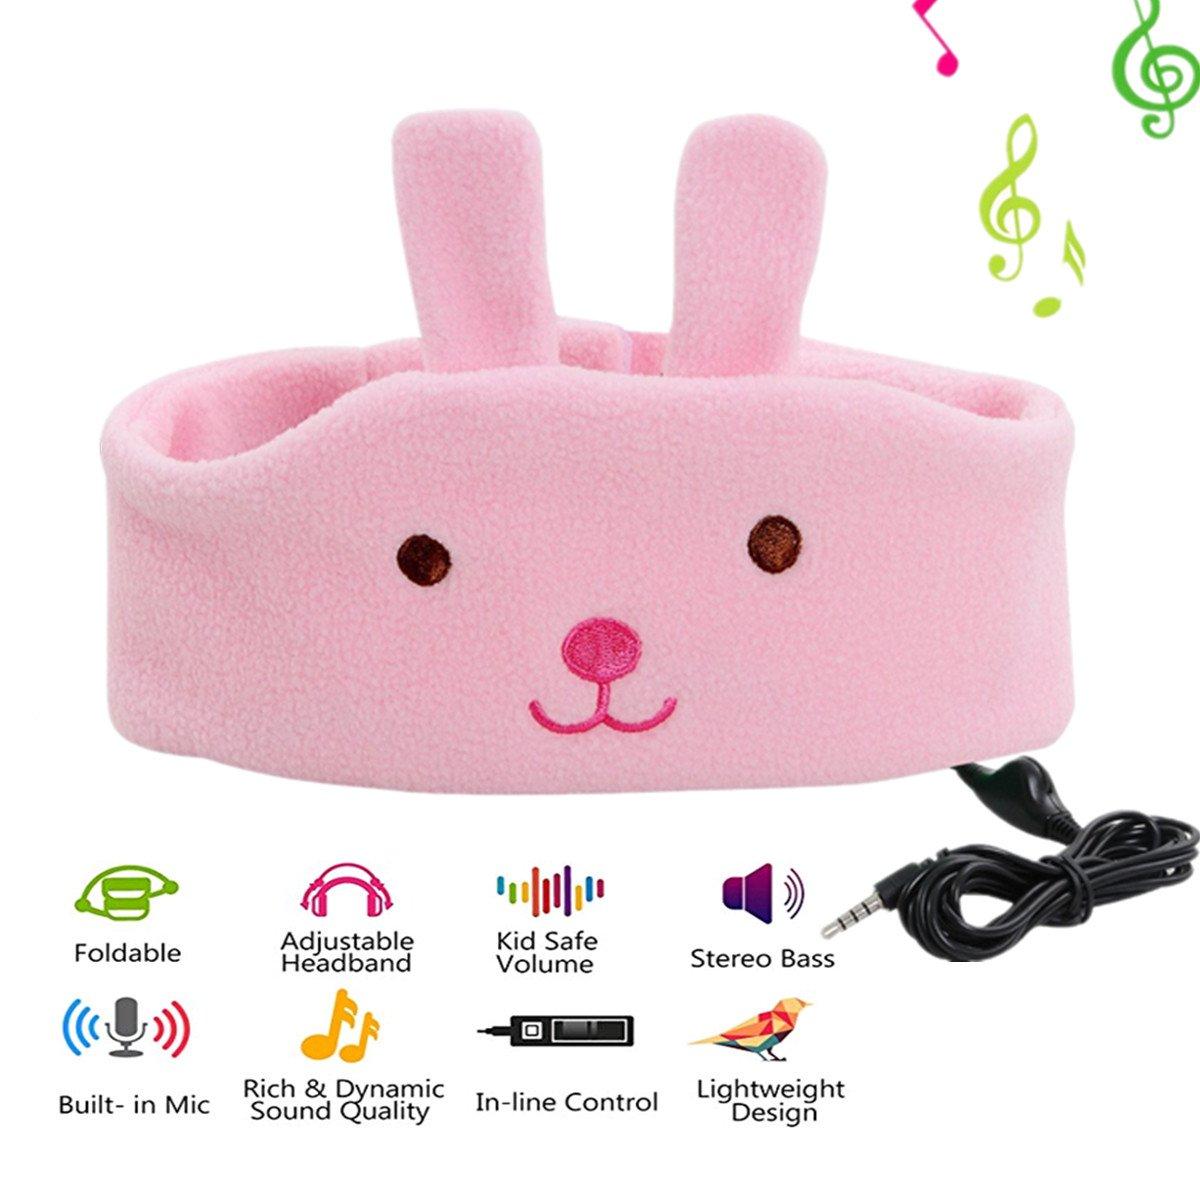 Auriculares ABOGALE Children Headband Music Headband Confortable Volume-Limited Soft Fleece Headband para Niños (Pink-Bu